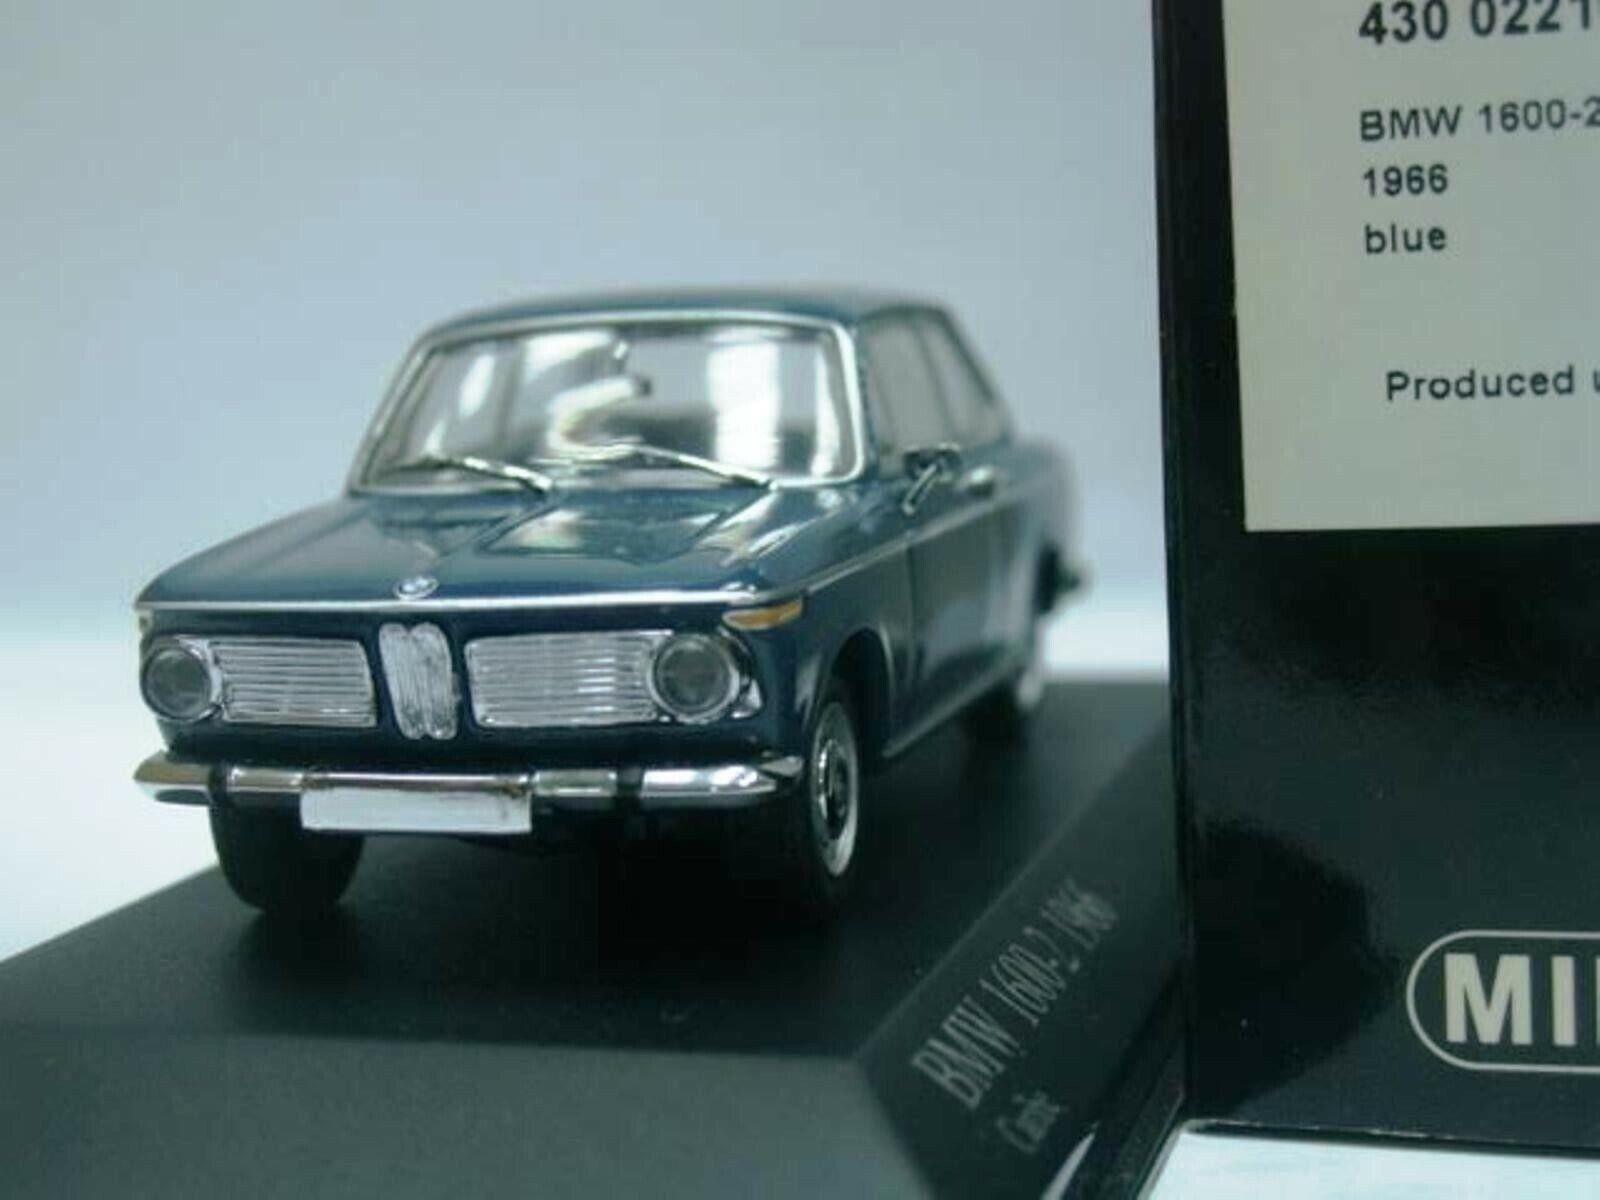 Wow extrêmement rare BMW 1600 2 typ 114 1966 Bleu 1 43 Minichamps - 1802 2000 2002